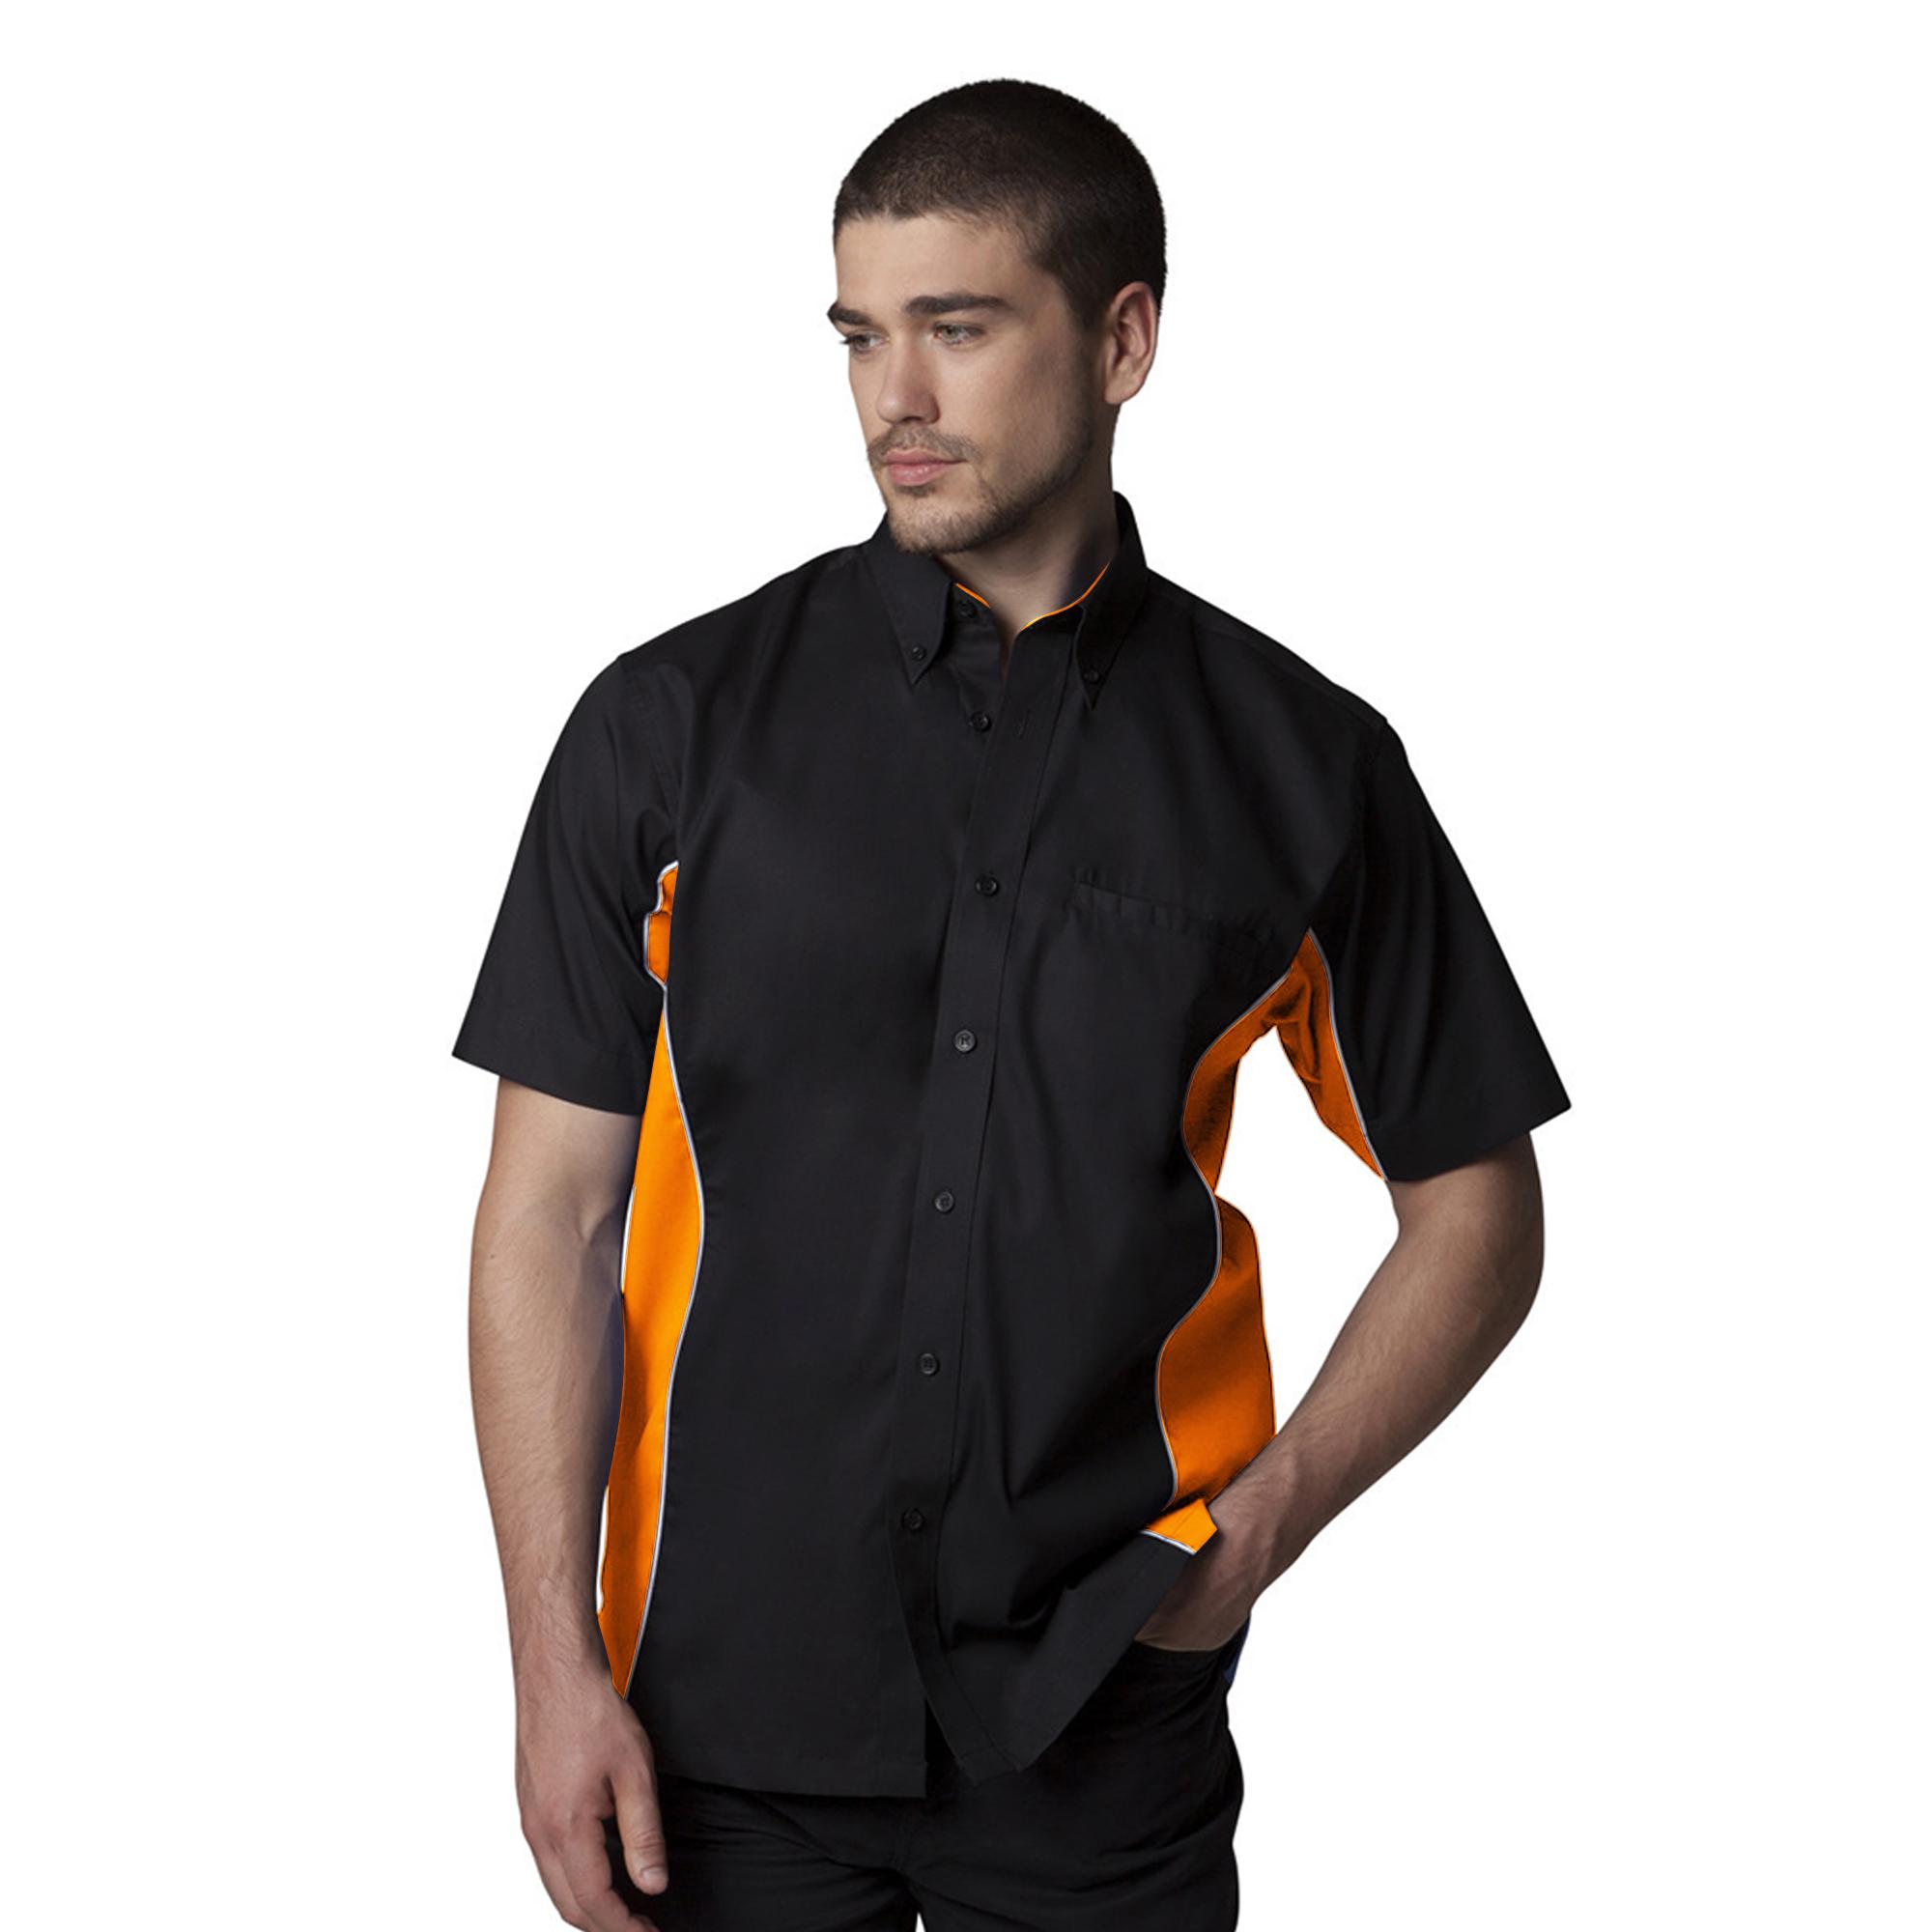 Gamegear Mens Sportsman Short Sleeve Shirt / Mens Sportswear (S) (Black/Red/White)